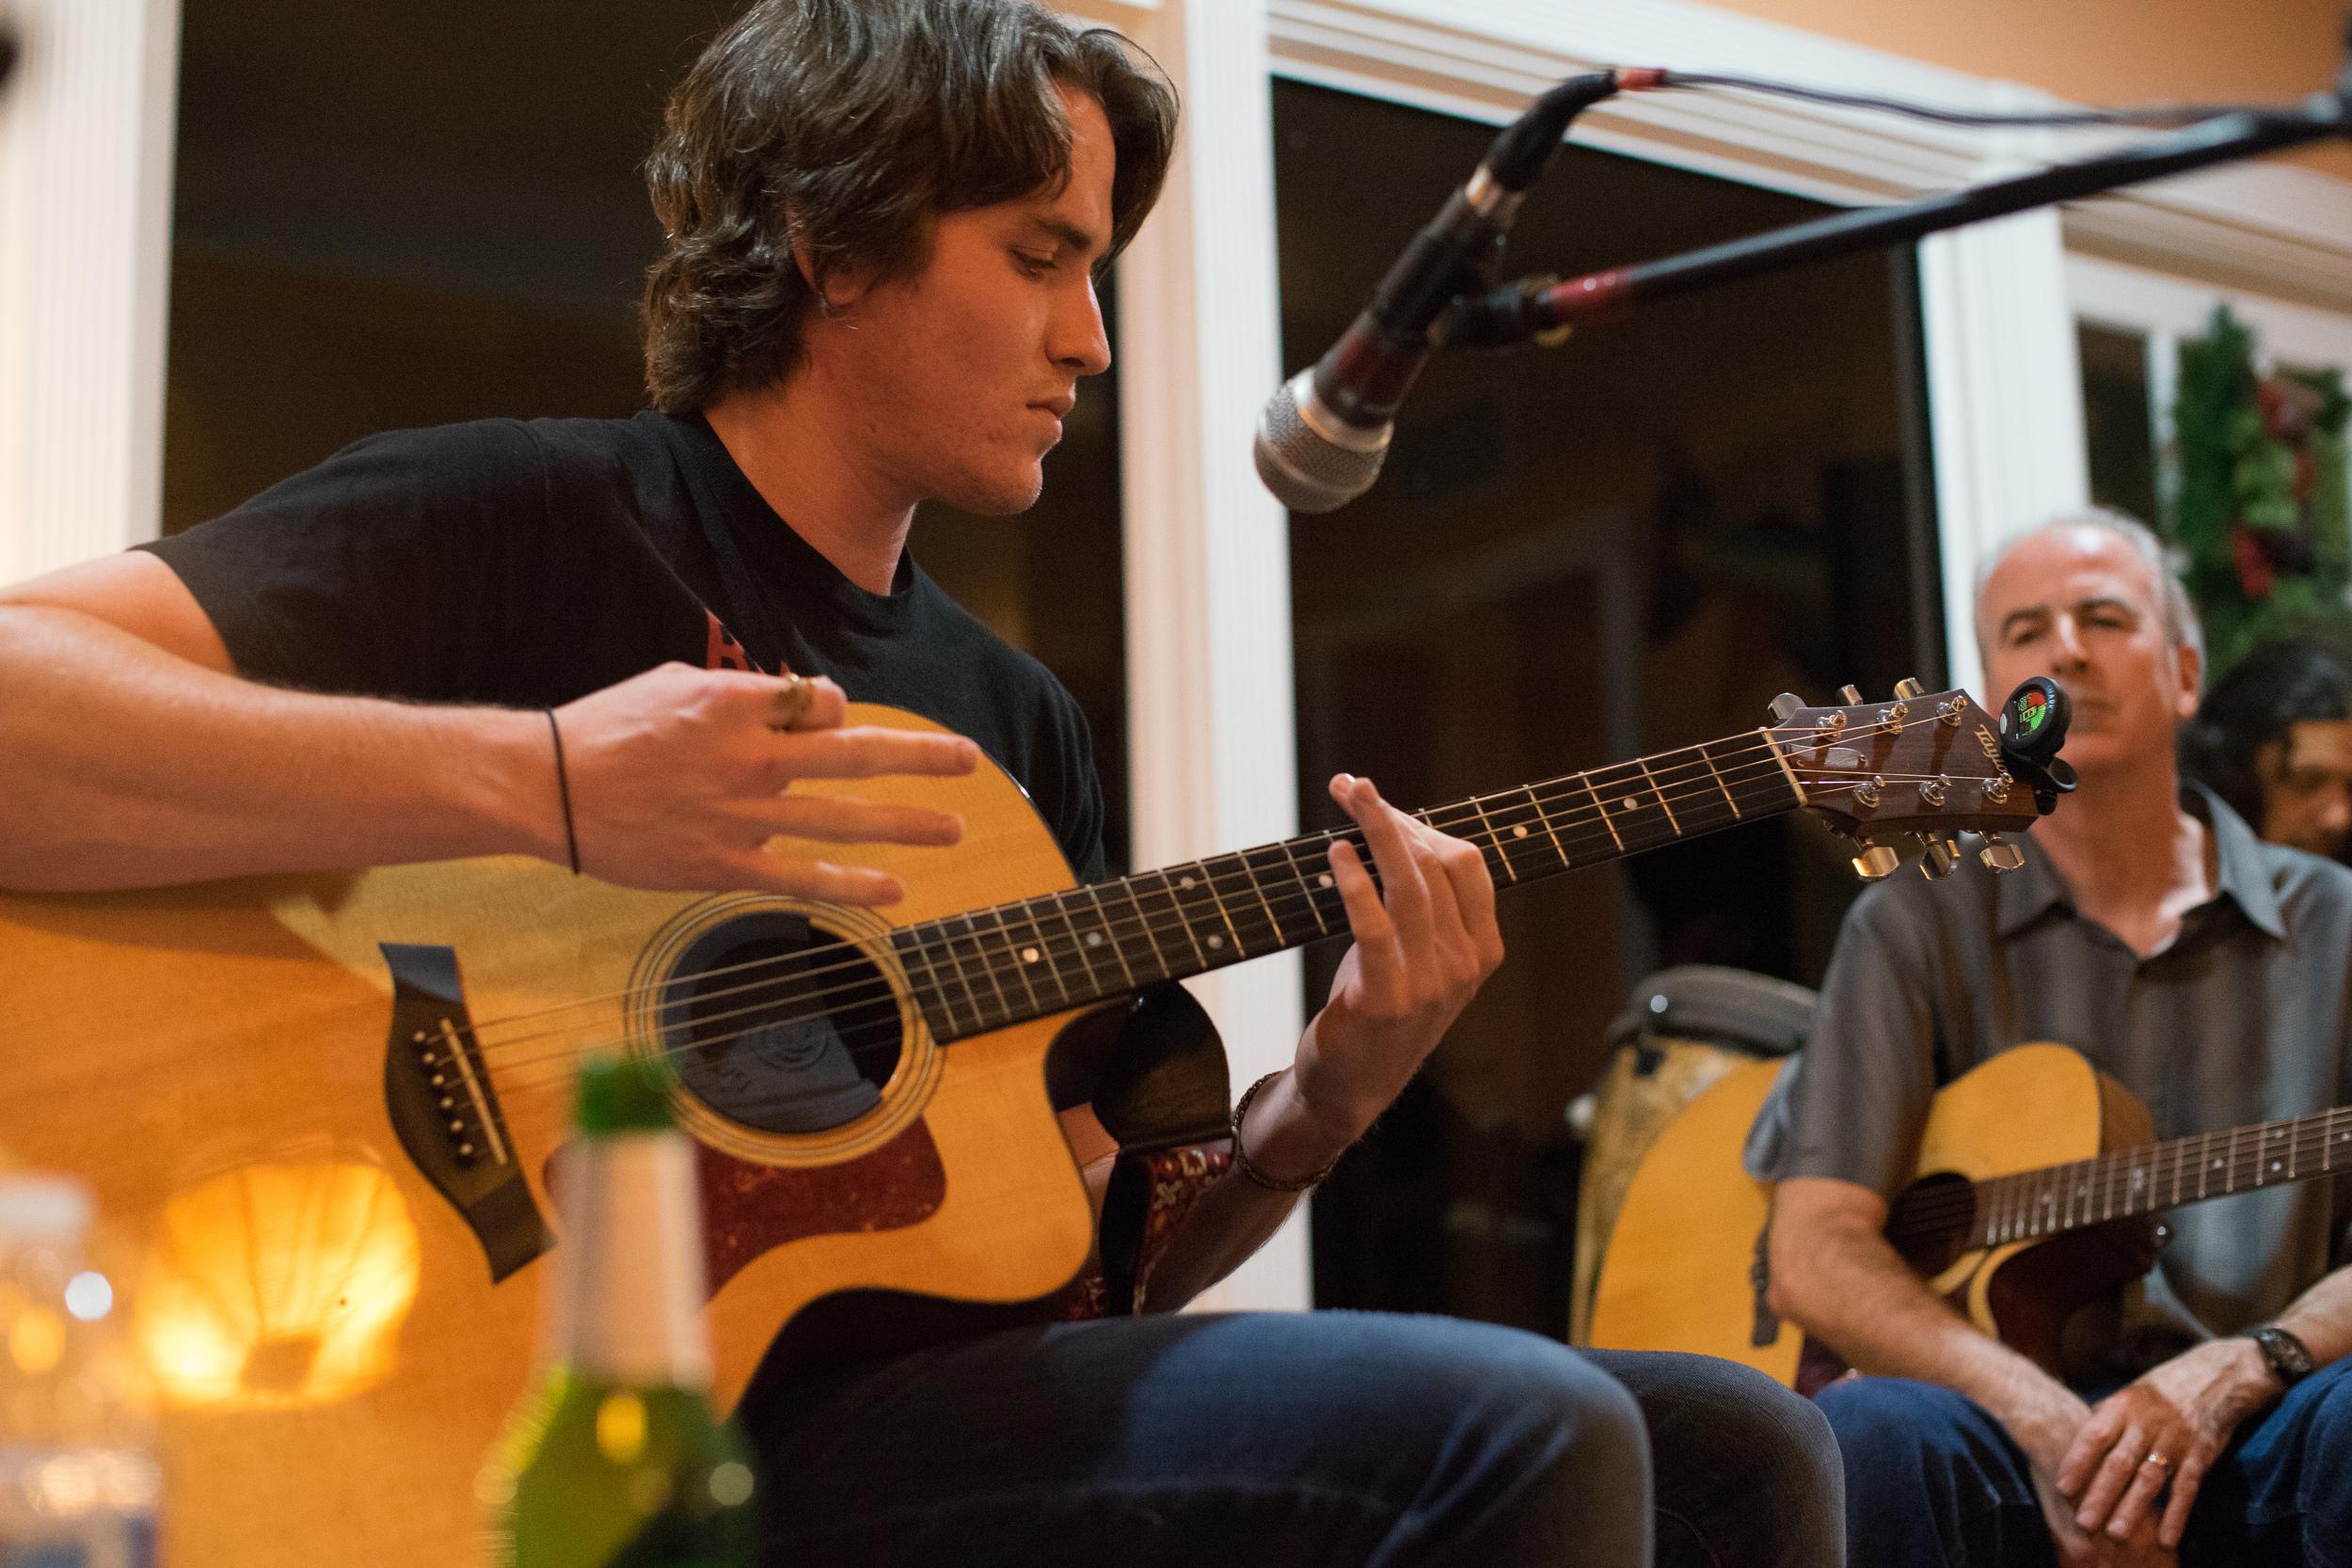 Patrick Milligan at the JMP House Concert,St. Petersburg, FL December 12, 2015 , photo credit: Mitchel Frick